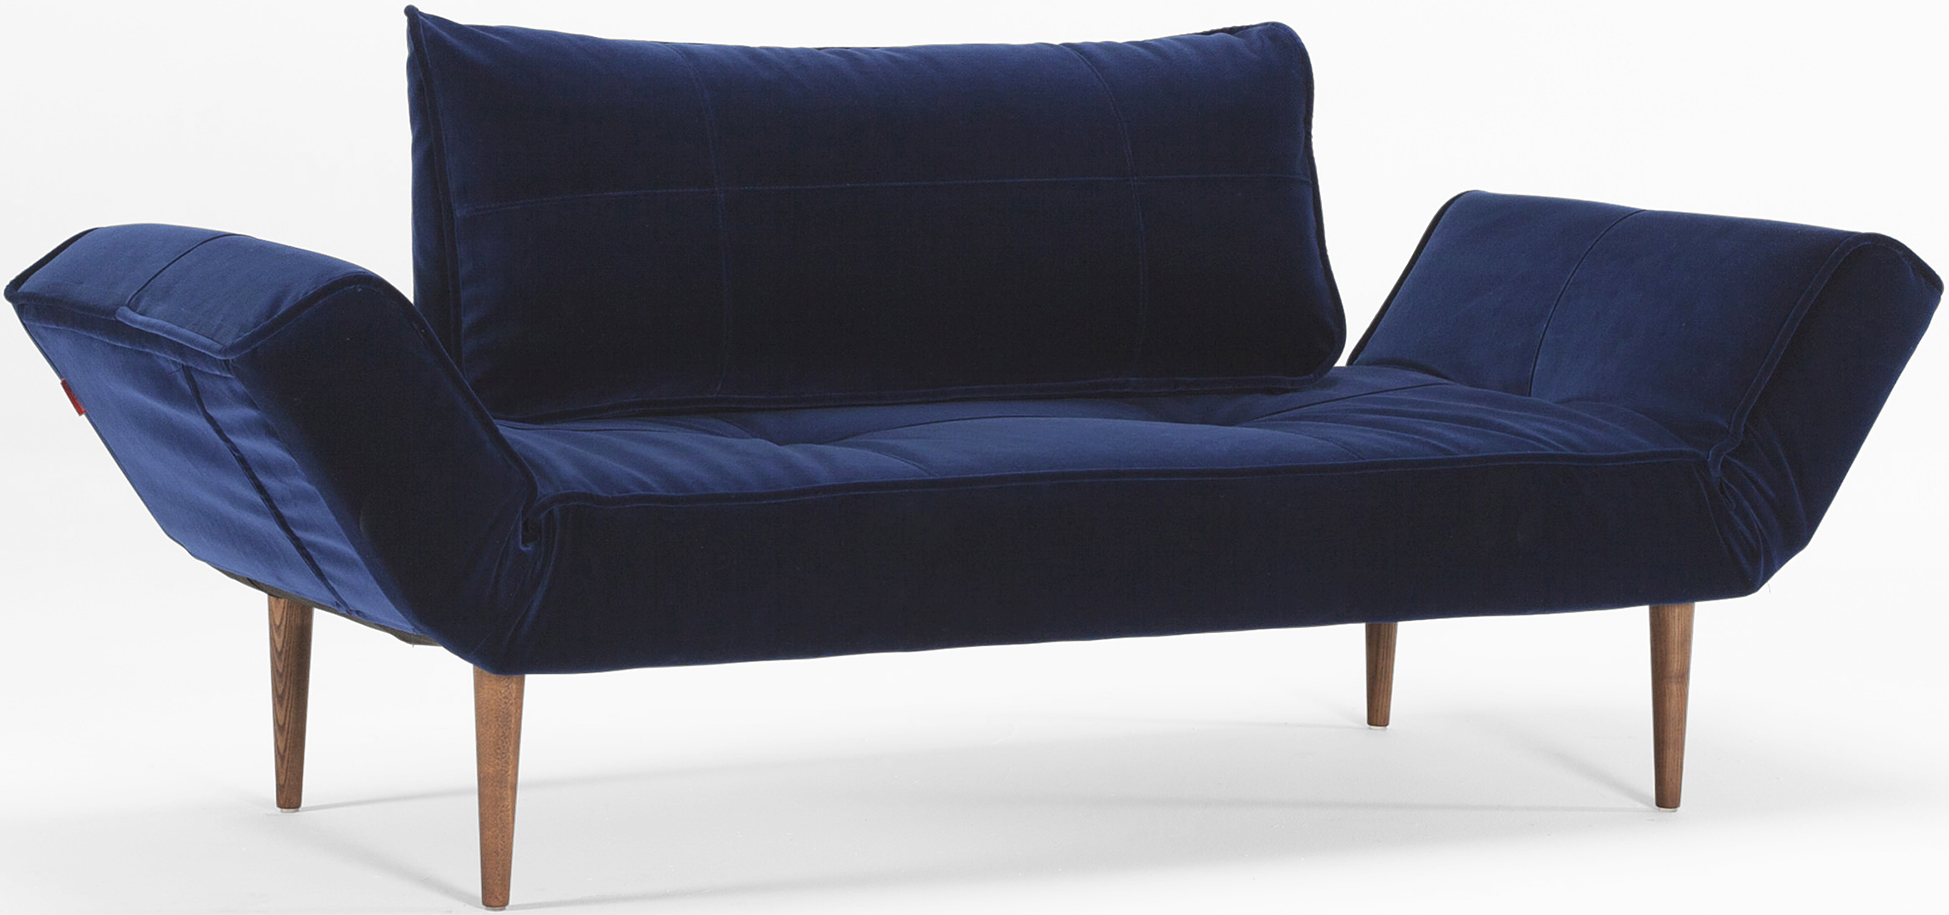 innovation zeal sofa dark styletto